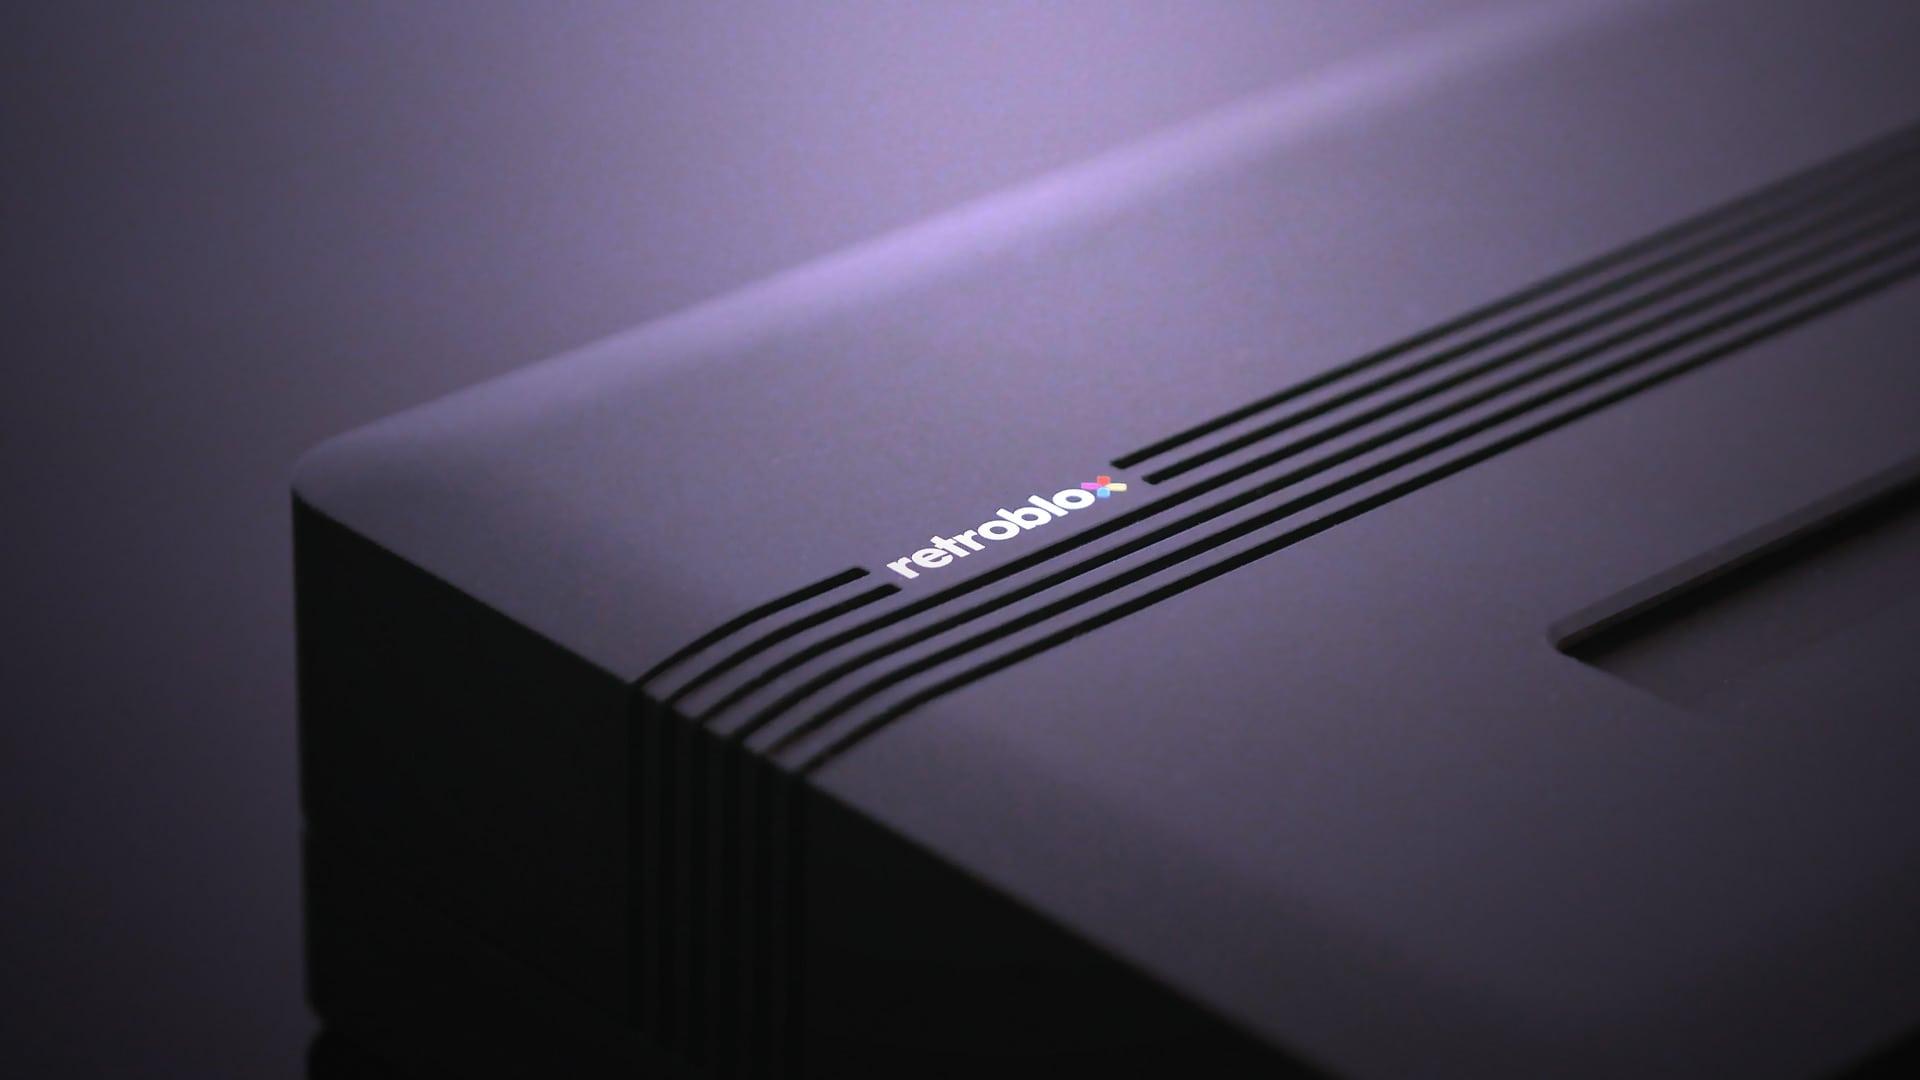 3 rbxpress 1920x1080 - Nowa konsola Polymega ze wsparciem m.in. dla PlayStation oraz Sega Saturn